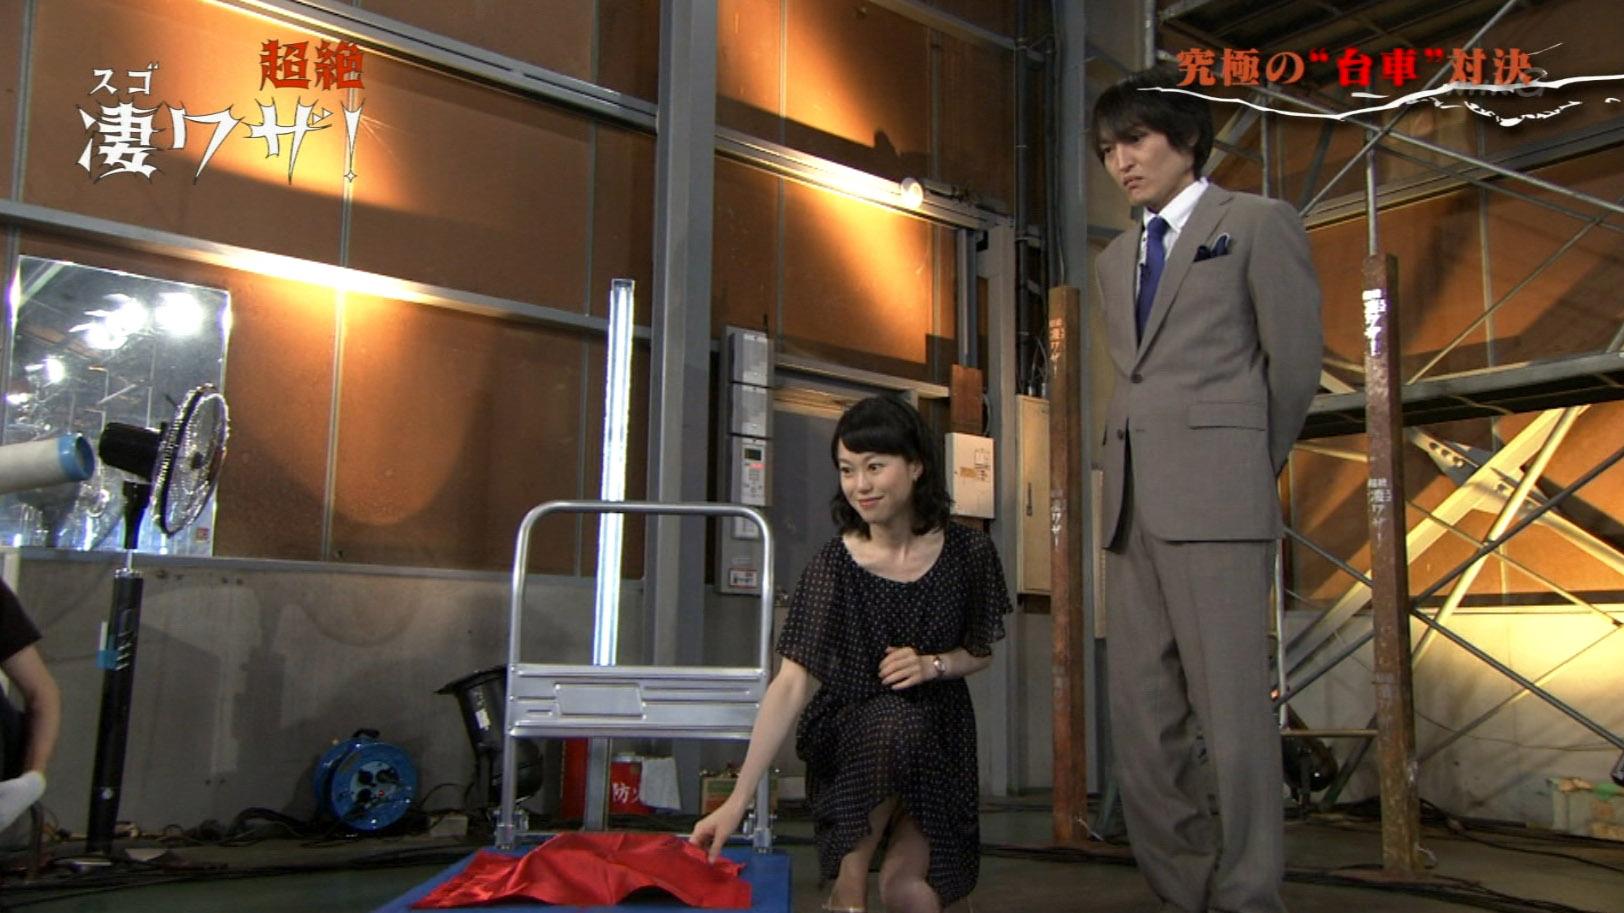 NHK・池田伸子アナ スカートの奥がチラリ! : アナきゃぷ速報